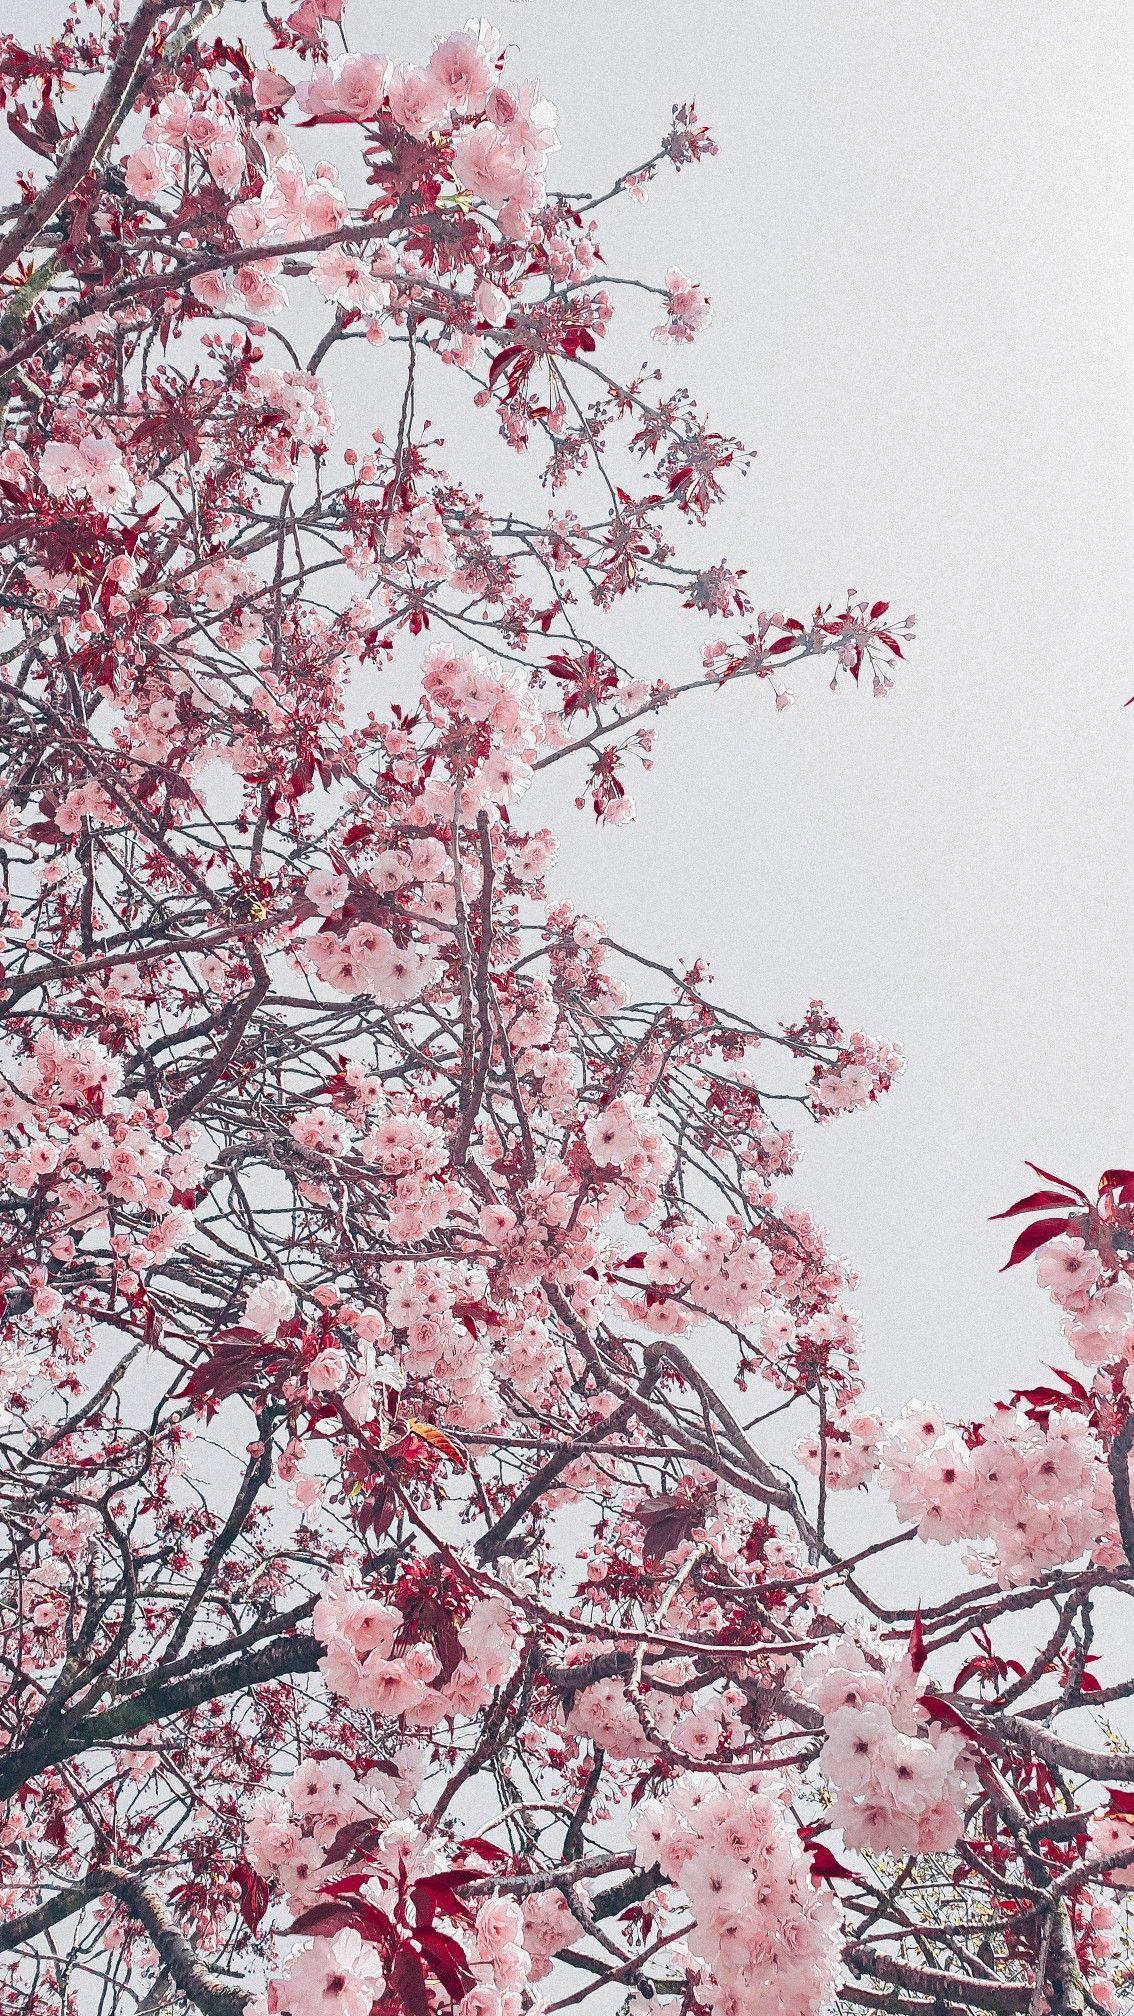 Cherry Blossom Aesthetic Gray Pink Sakura Cherry Blossom Wallpaper Iphone Cherry Blossom Wallpaper Cherry Blossom Japan